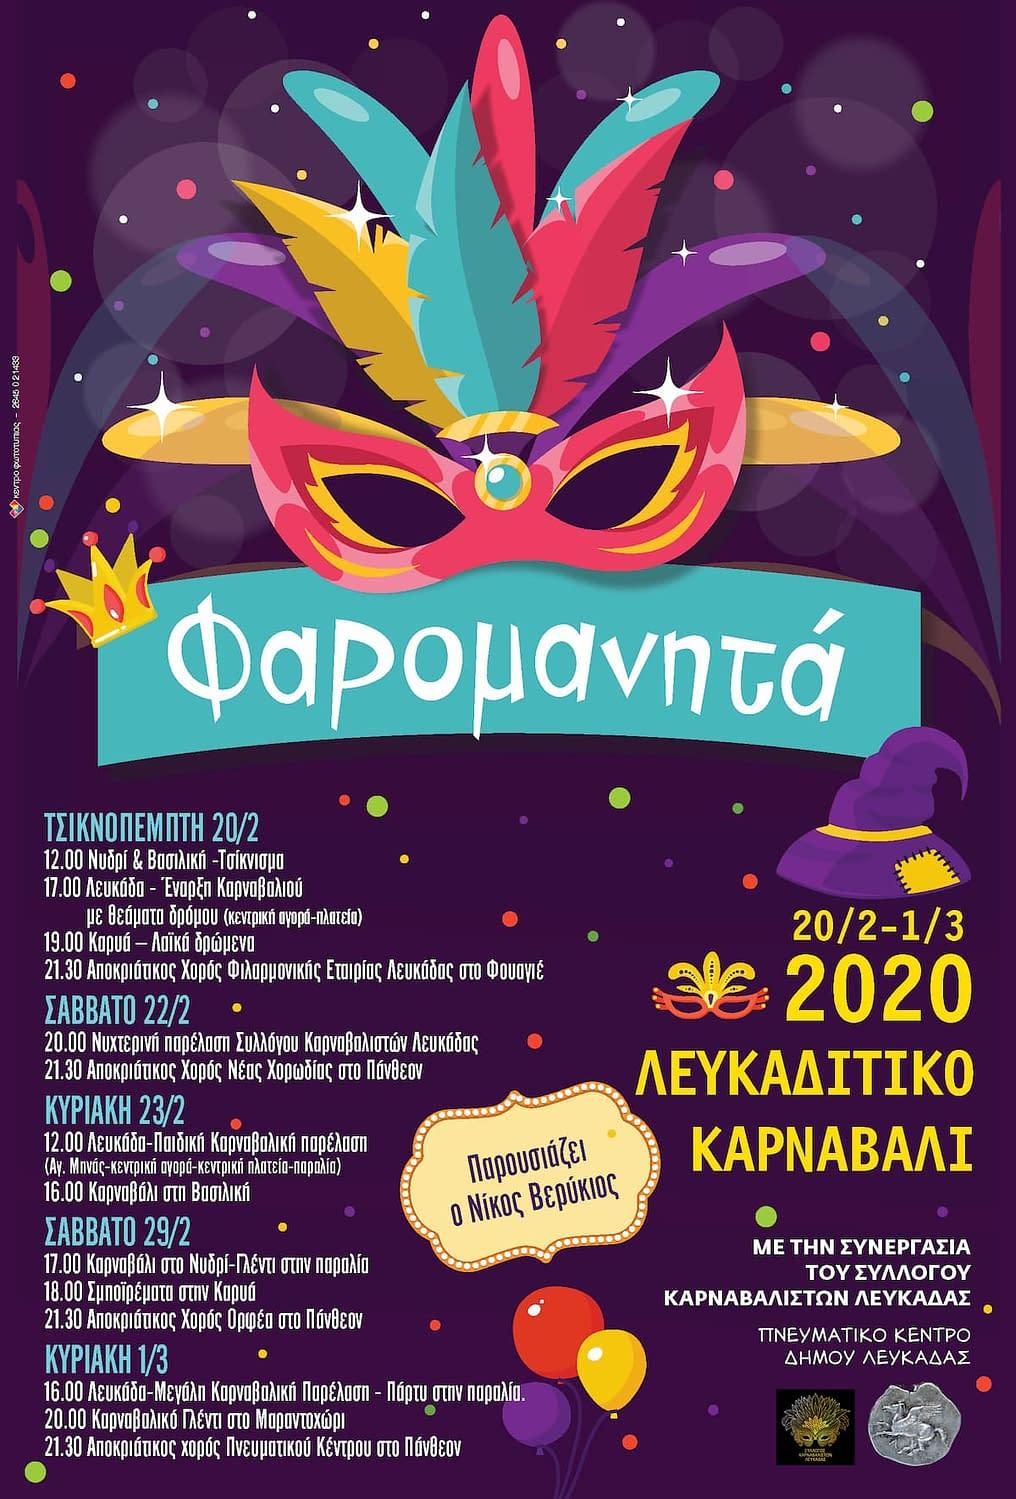 the-official-schedule-of-lefkada-carnival-season-faromanita-2020-greek-language